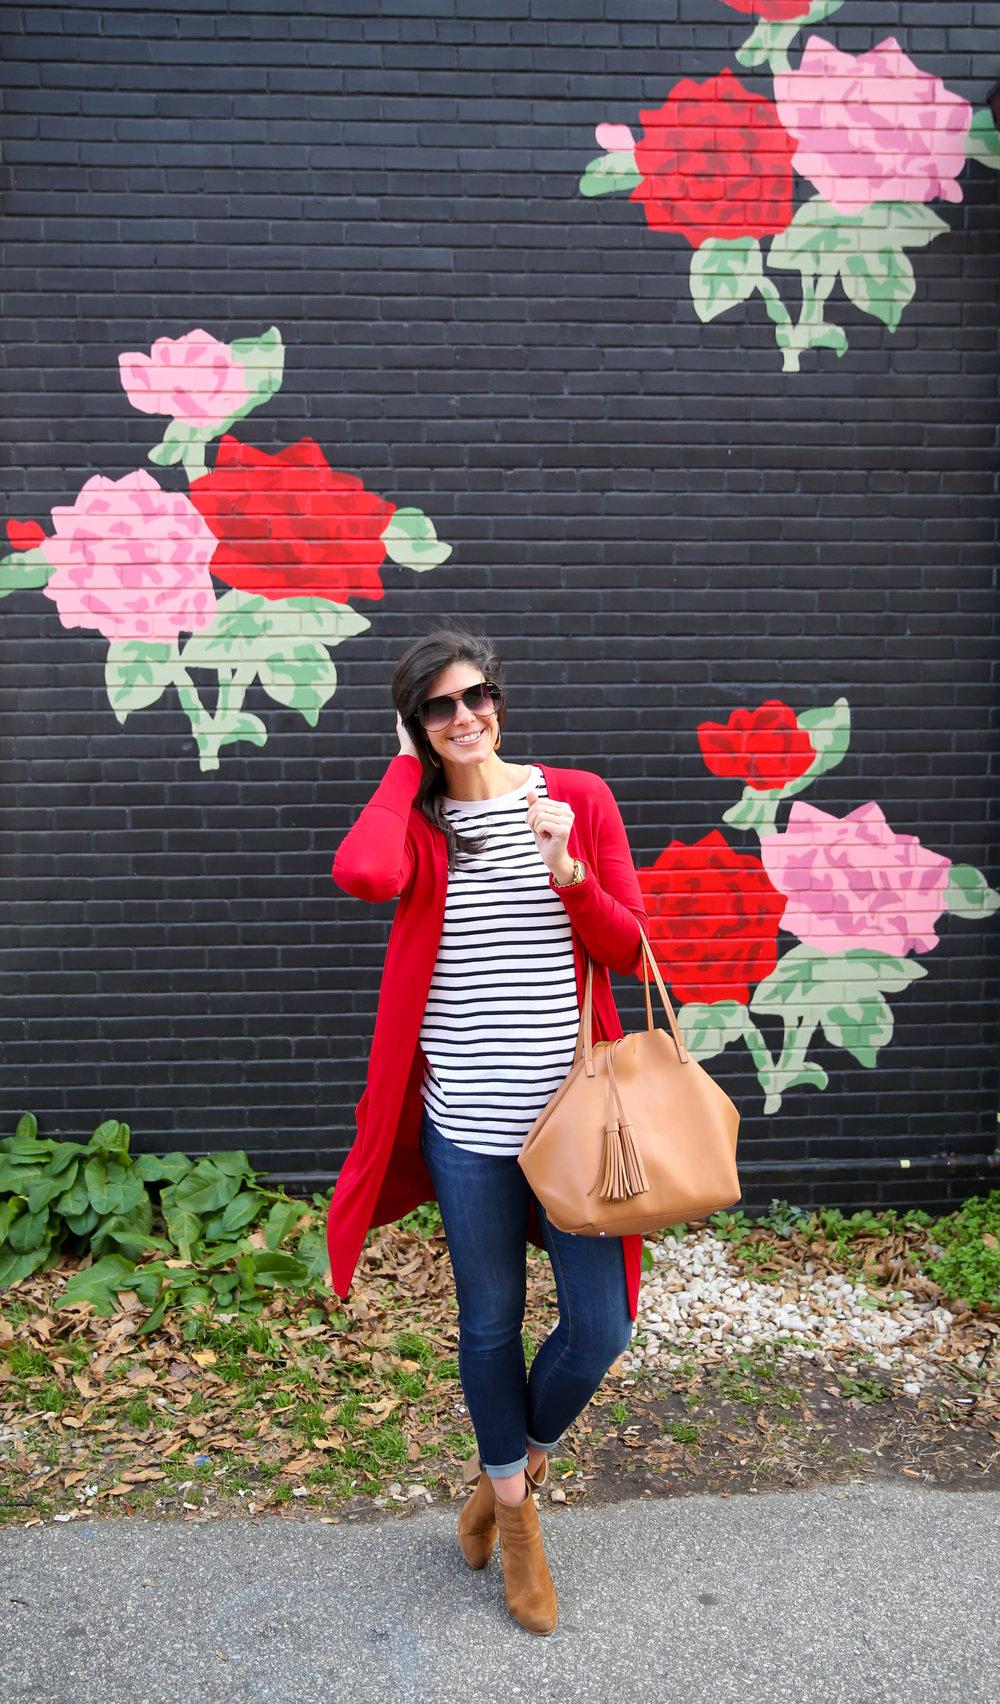 red-cardigan-stripes-shirt-cute-ootd-lauren-schwaiger-style-blog.jpg